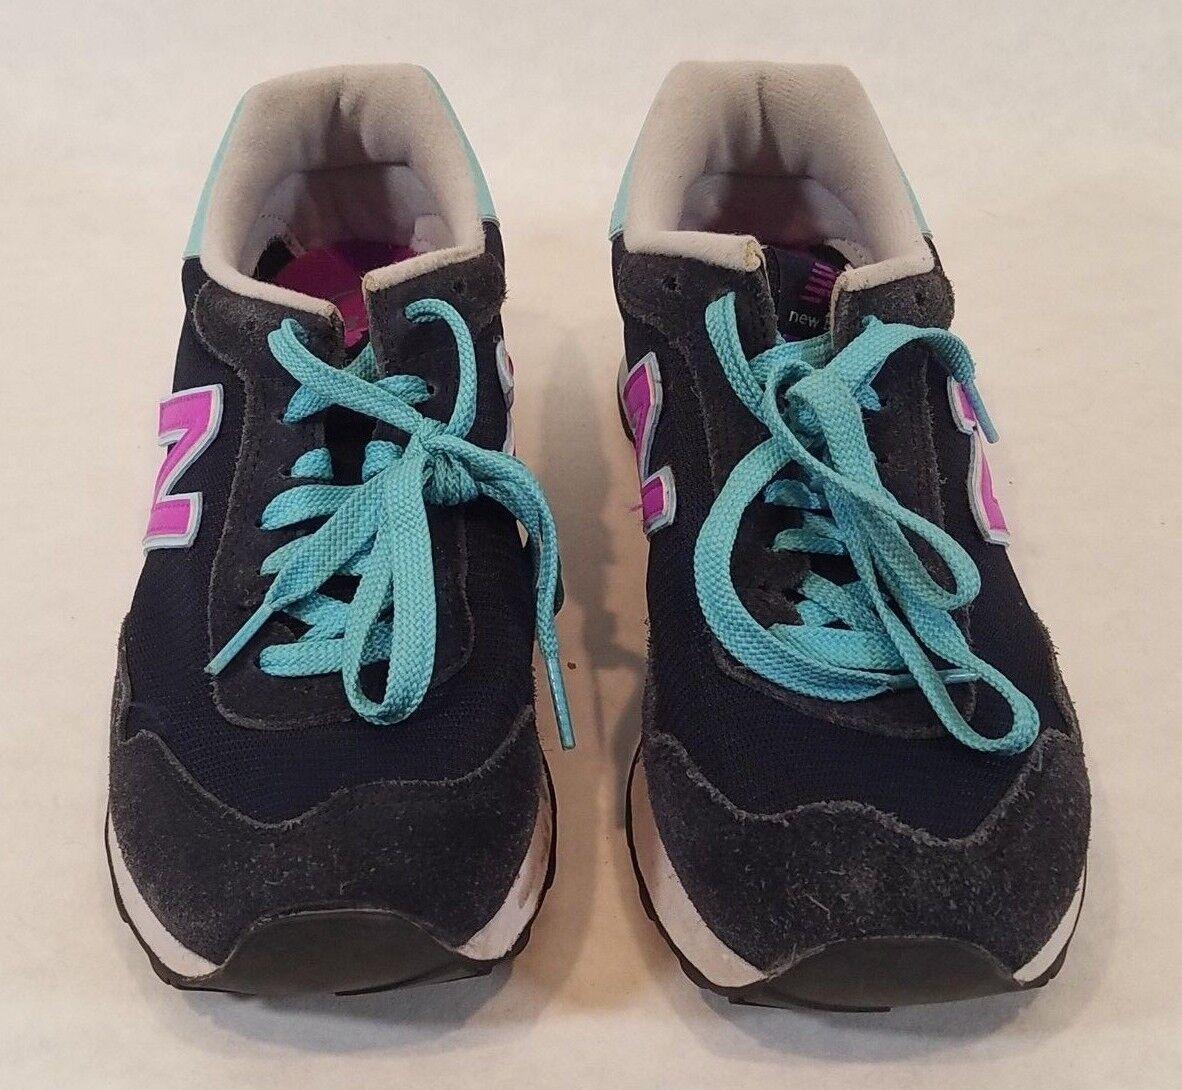 Women's New Balance WL515STV Violet Blue Black 9 Sneaker Shoe Size 9 Black 7c7e6f